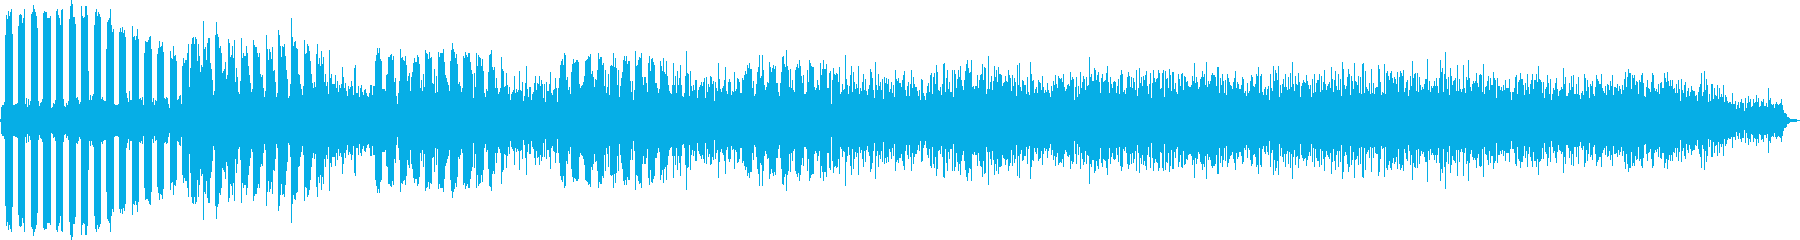 AMGアナログFX 28の再生済みの波形